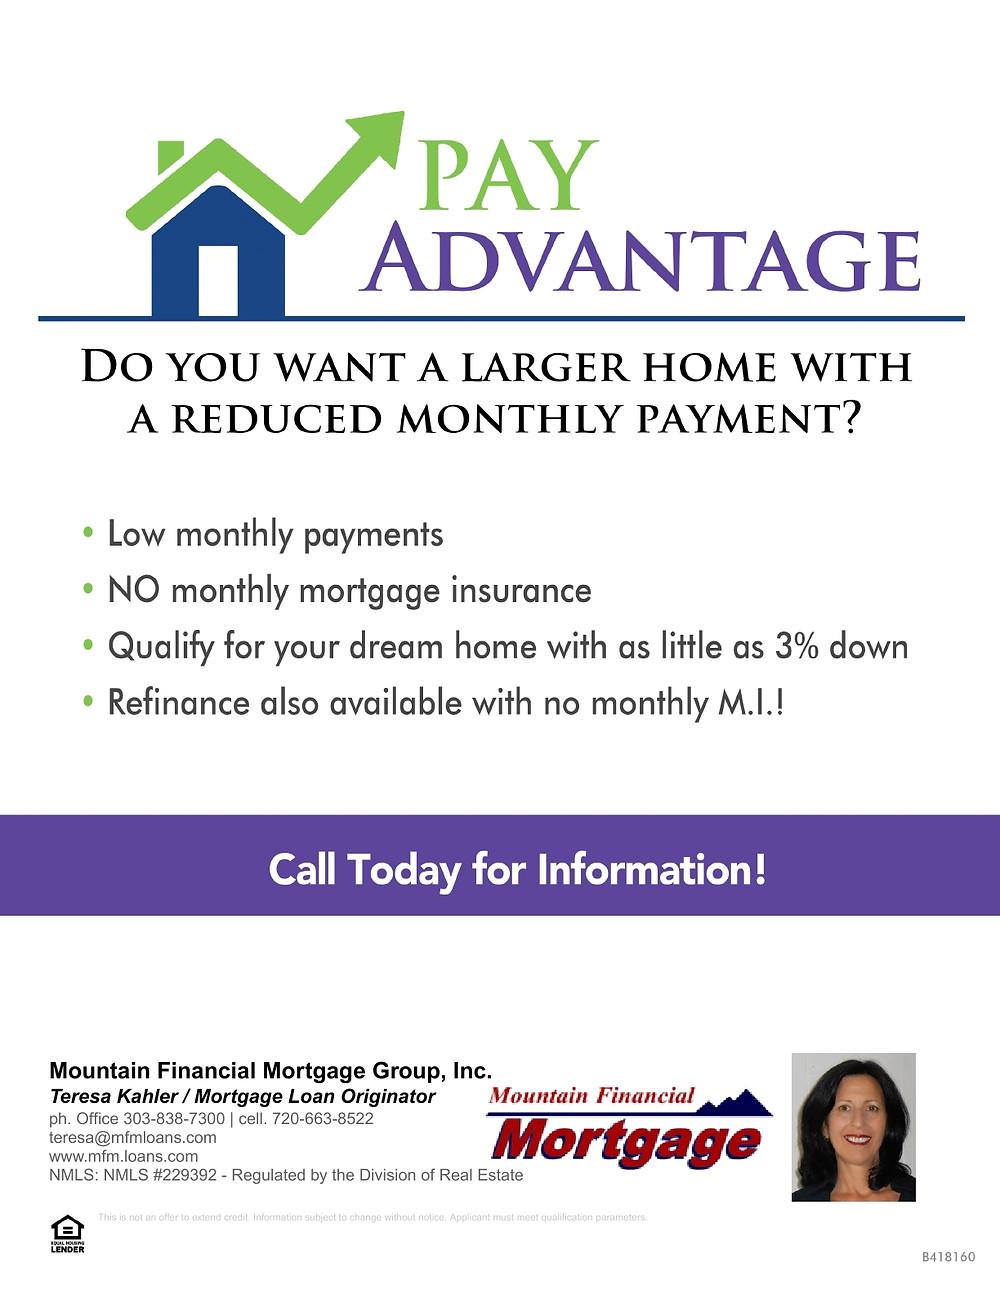 Mountain Financial Mortgage Pay Advantage Loan.jpg